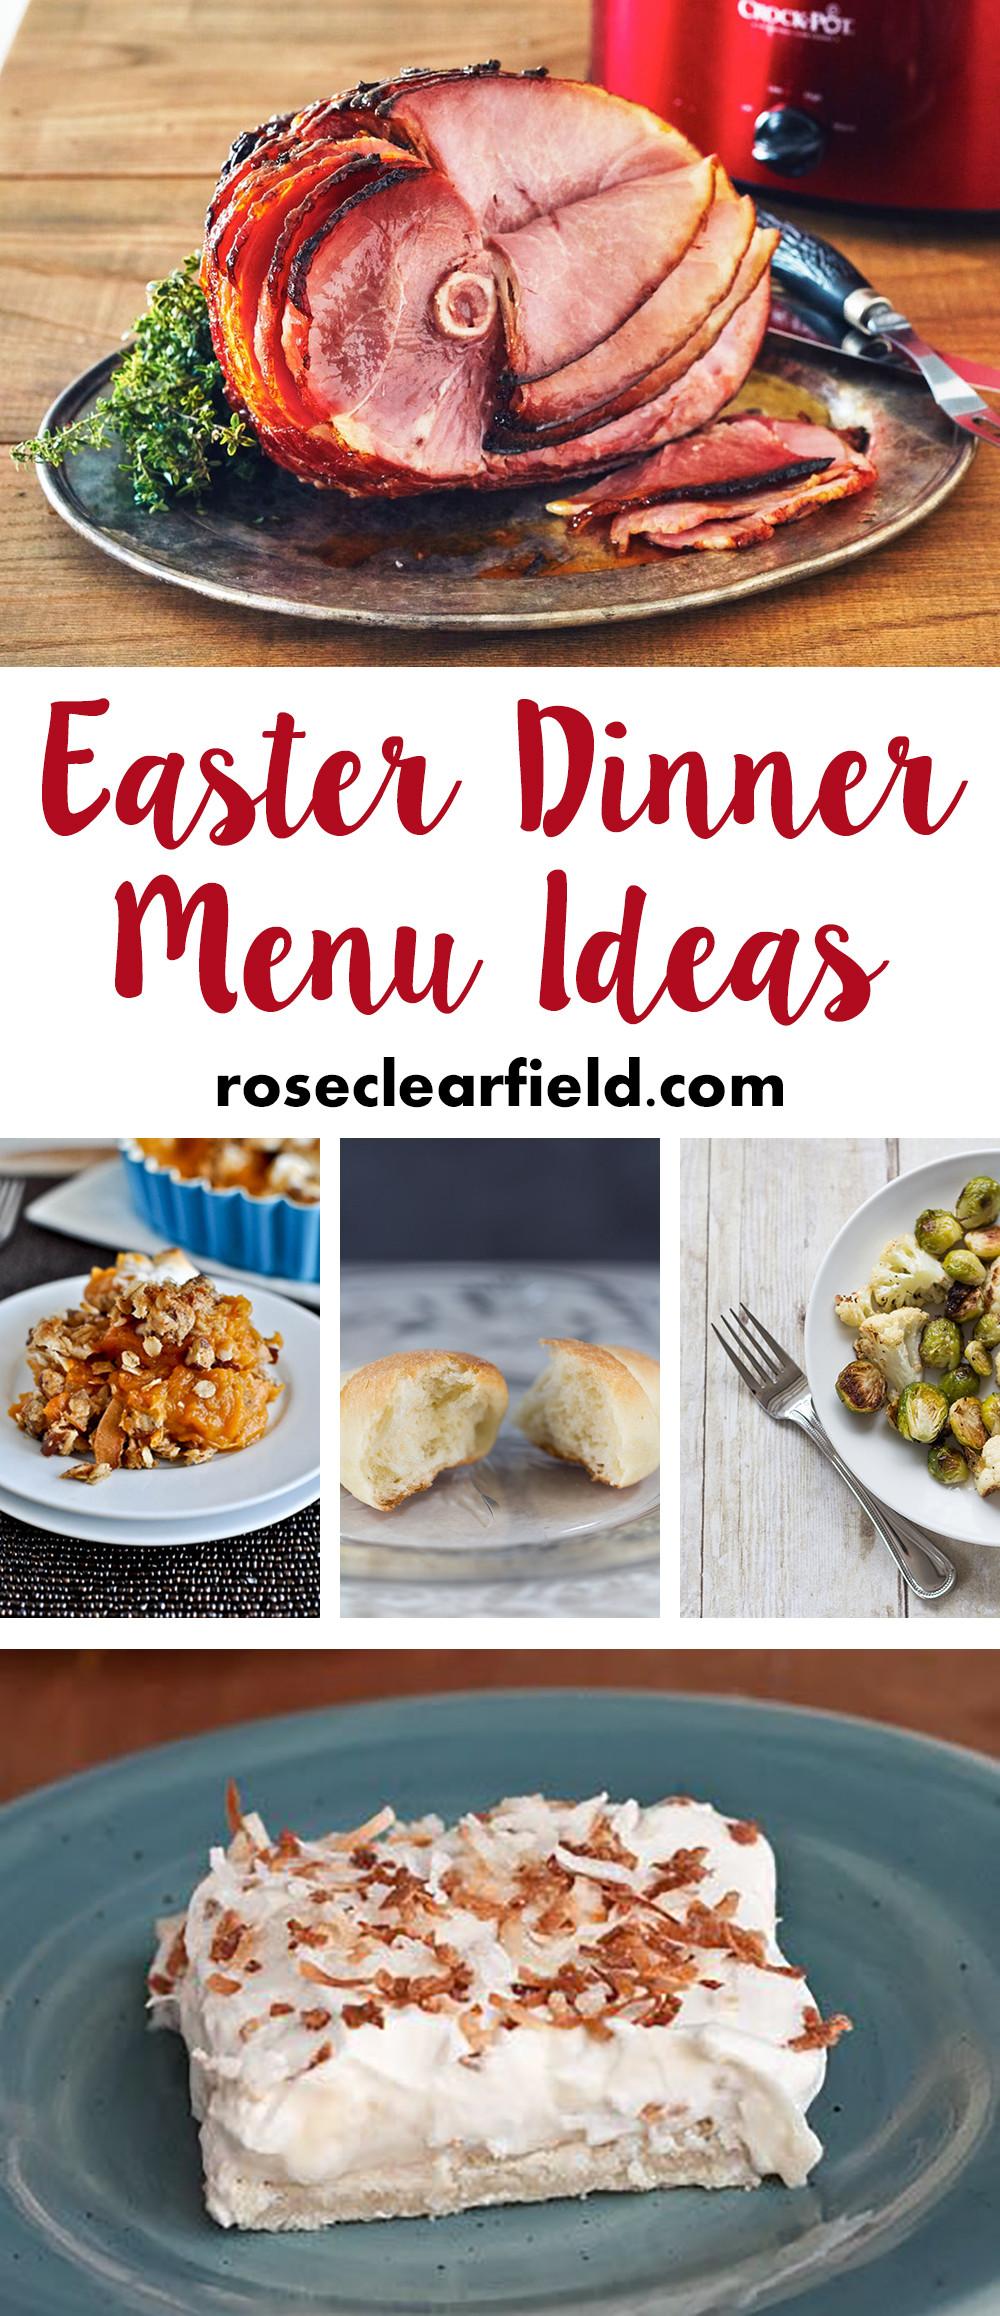 Easter Dinner Menu Ideas  Easter Dinner Menu Ideas • Rose Clearfield